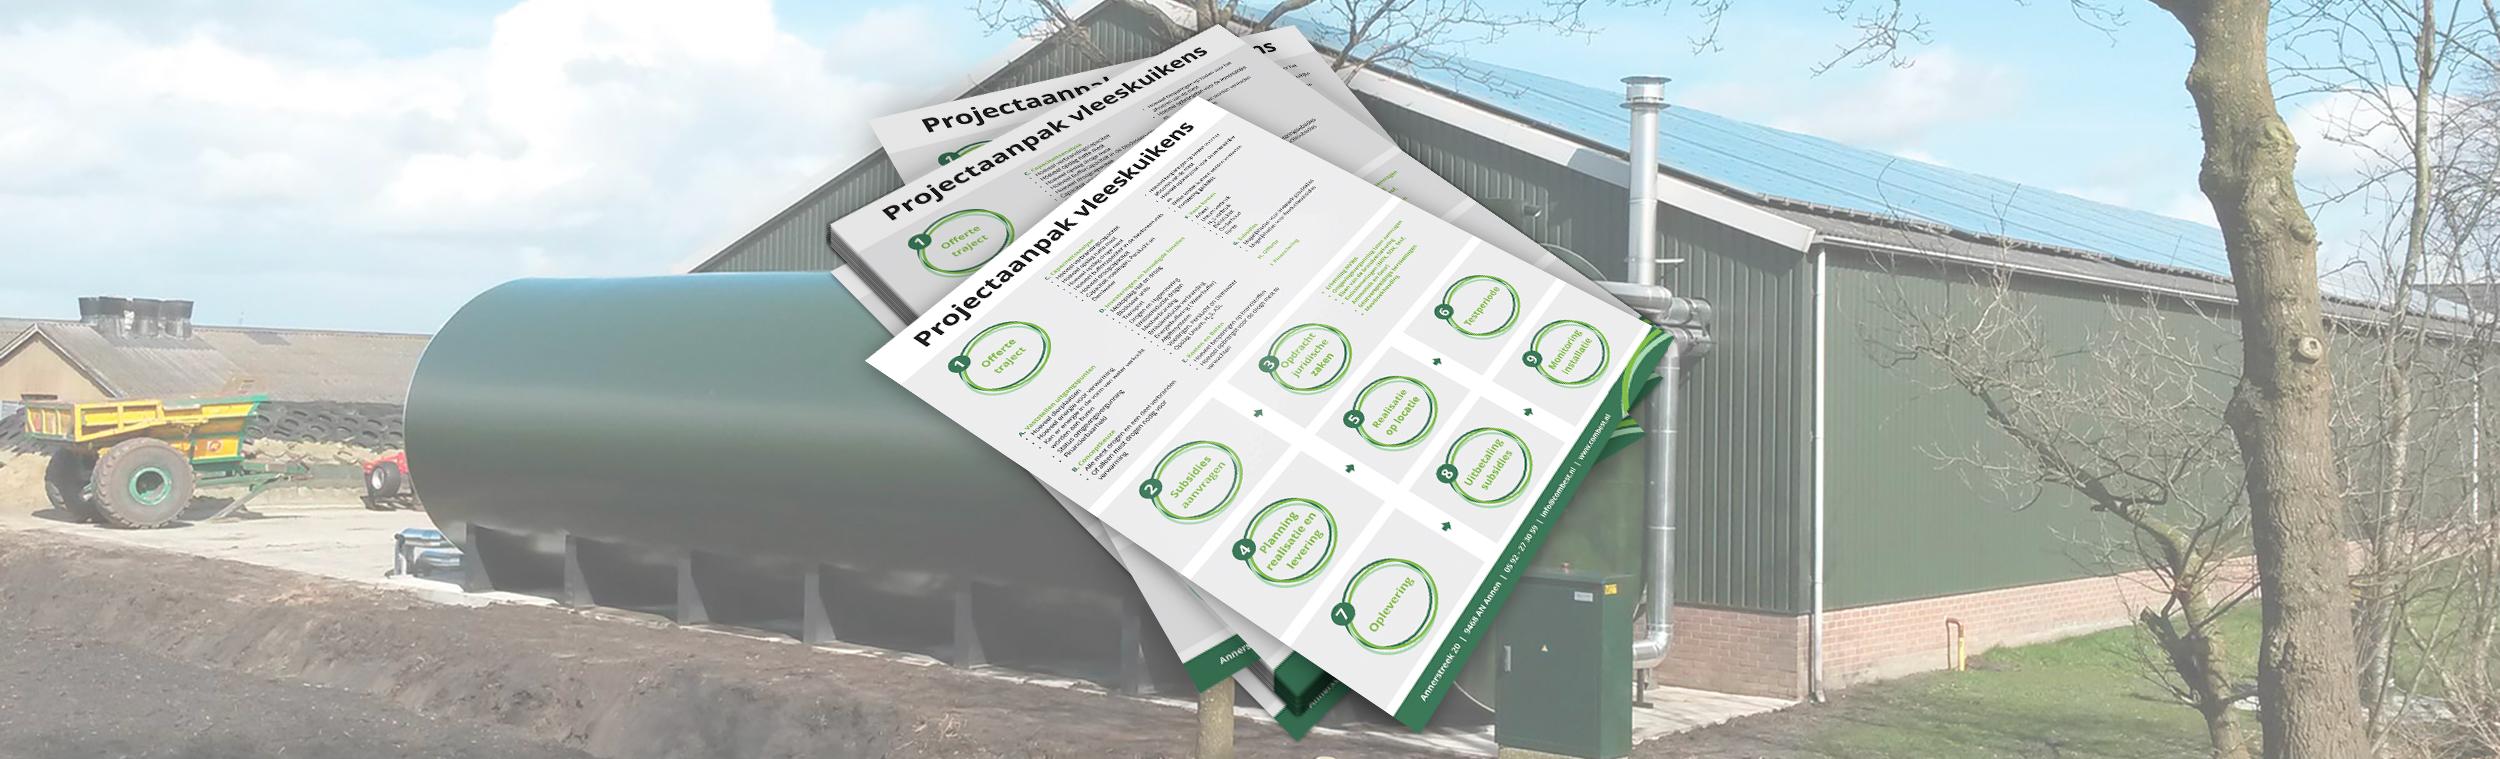 portfolio-combest-projectaanpak